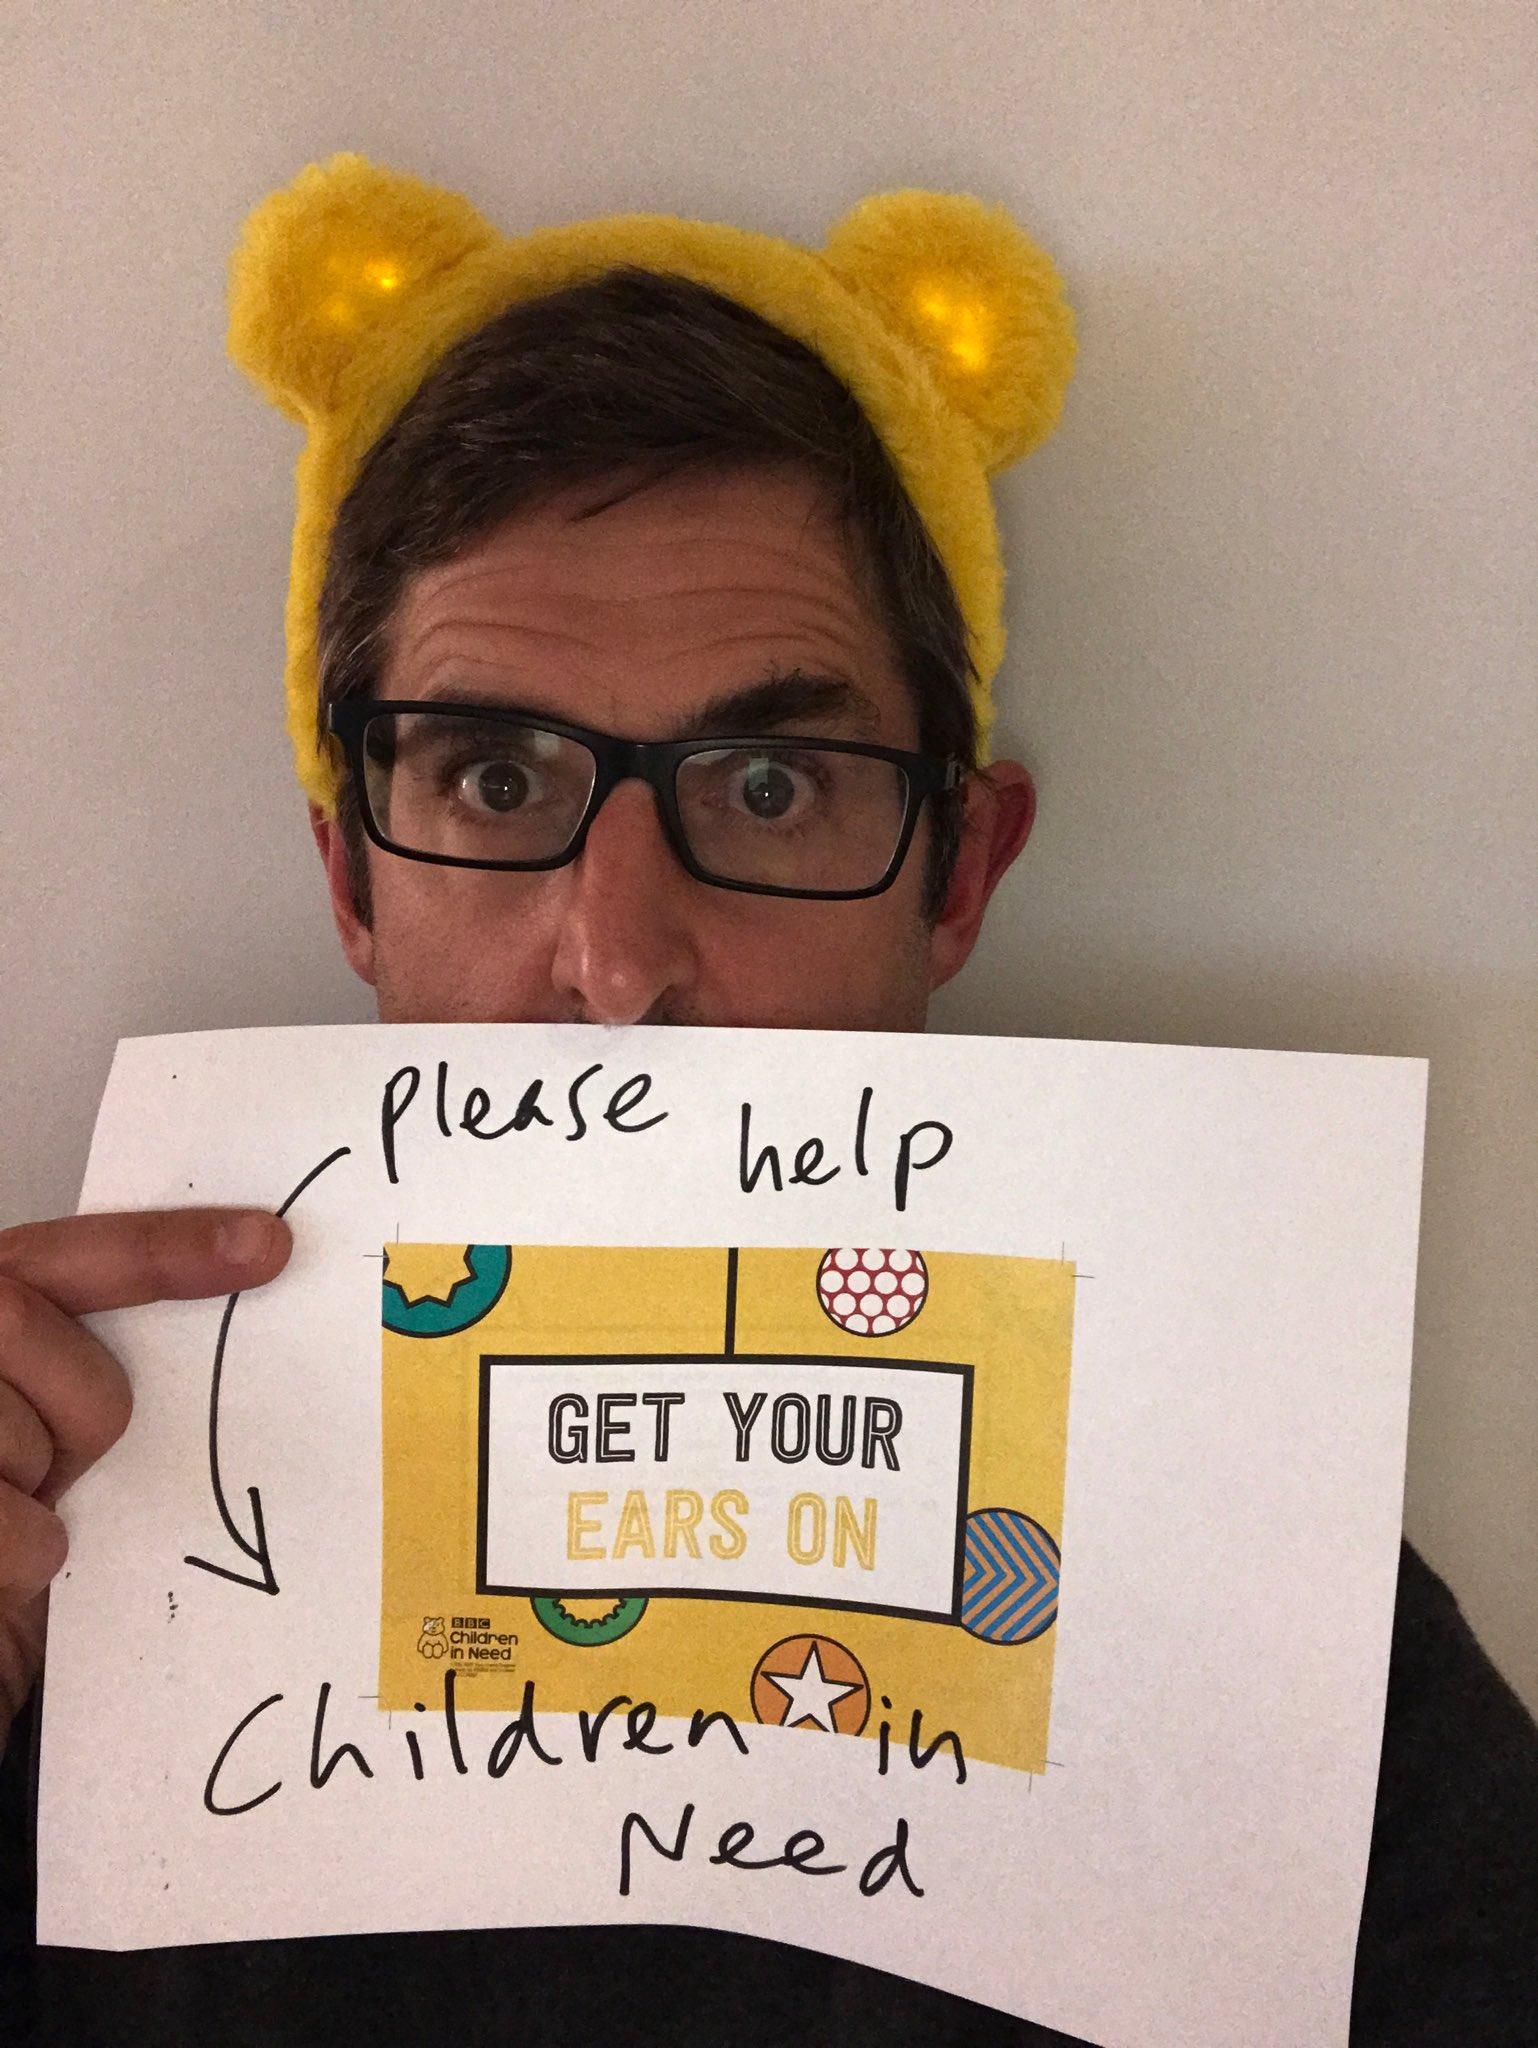 Apologies for wonky glasses. @BBCCiN #CiN https://t.co/FOtpjGQ6y9